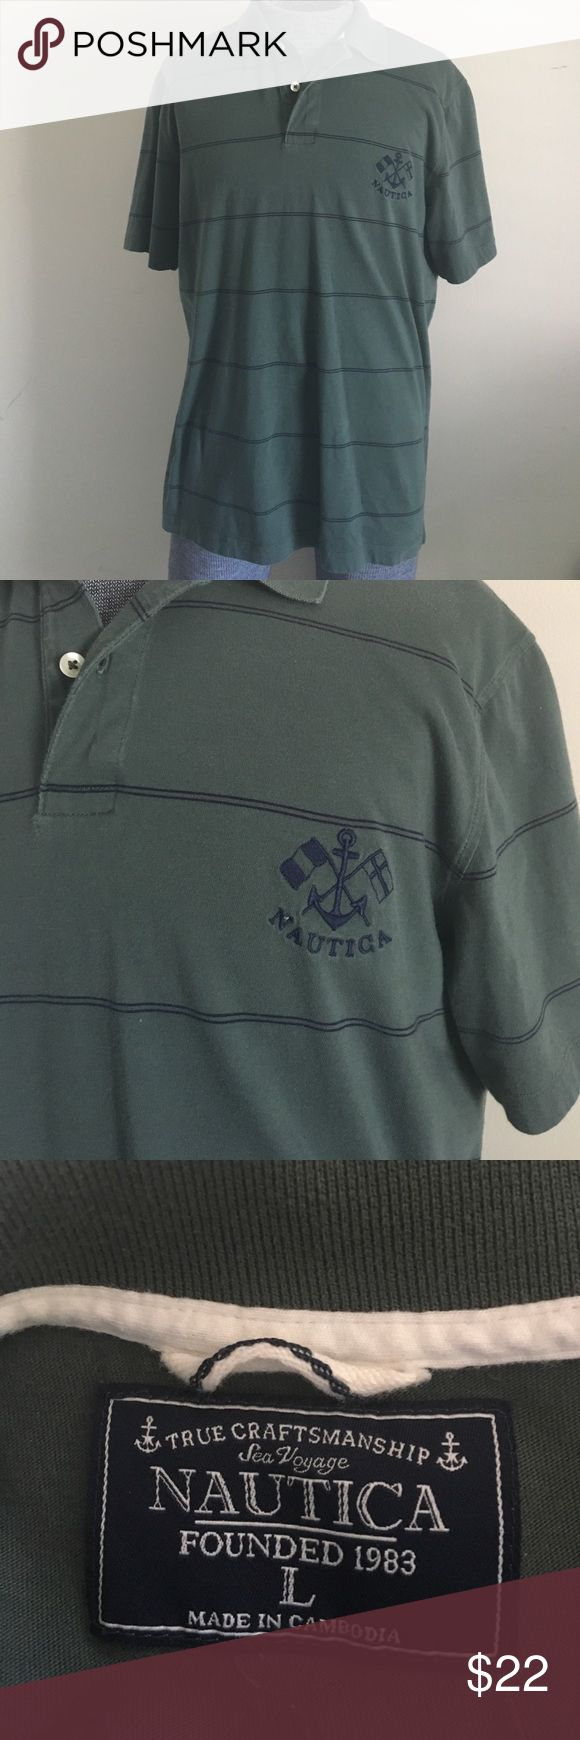 NAUTICA Men's Pima Cotton Polo Shirt Size L NAUTICA men's Pima Cotton Polo Shirt , Size L , 100% Pima cotton, good condition Nautica Shirts Polos